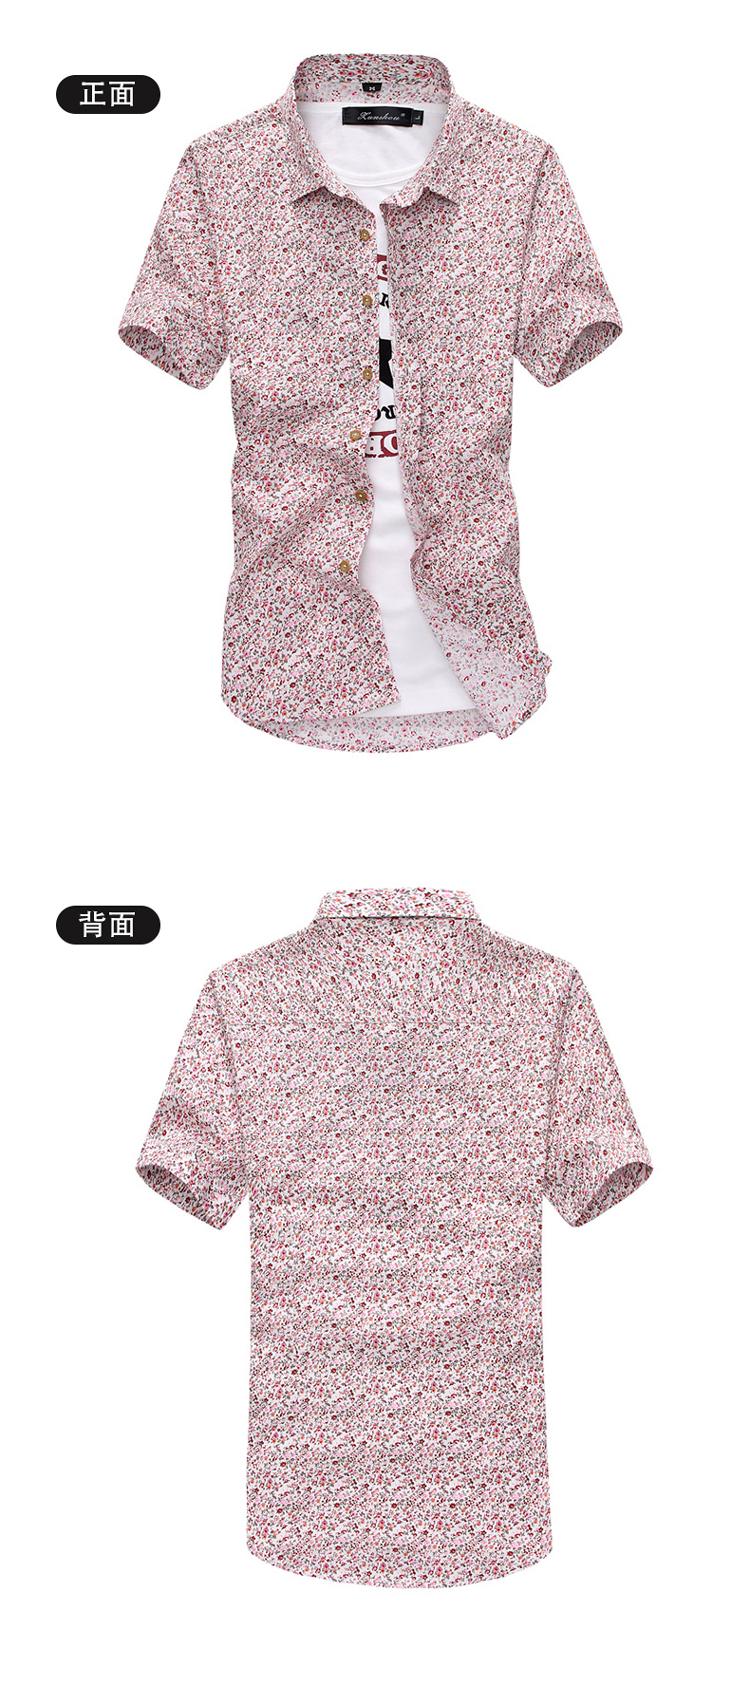 Men Summer Thin Shirts Short Sleeve Floral Shirts New Fashion Men Outwear Casual Slim Shirts Mens Cotton dress shirts 10